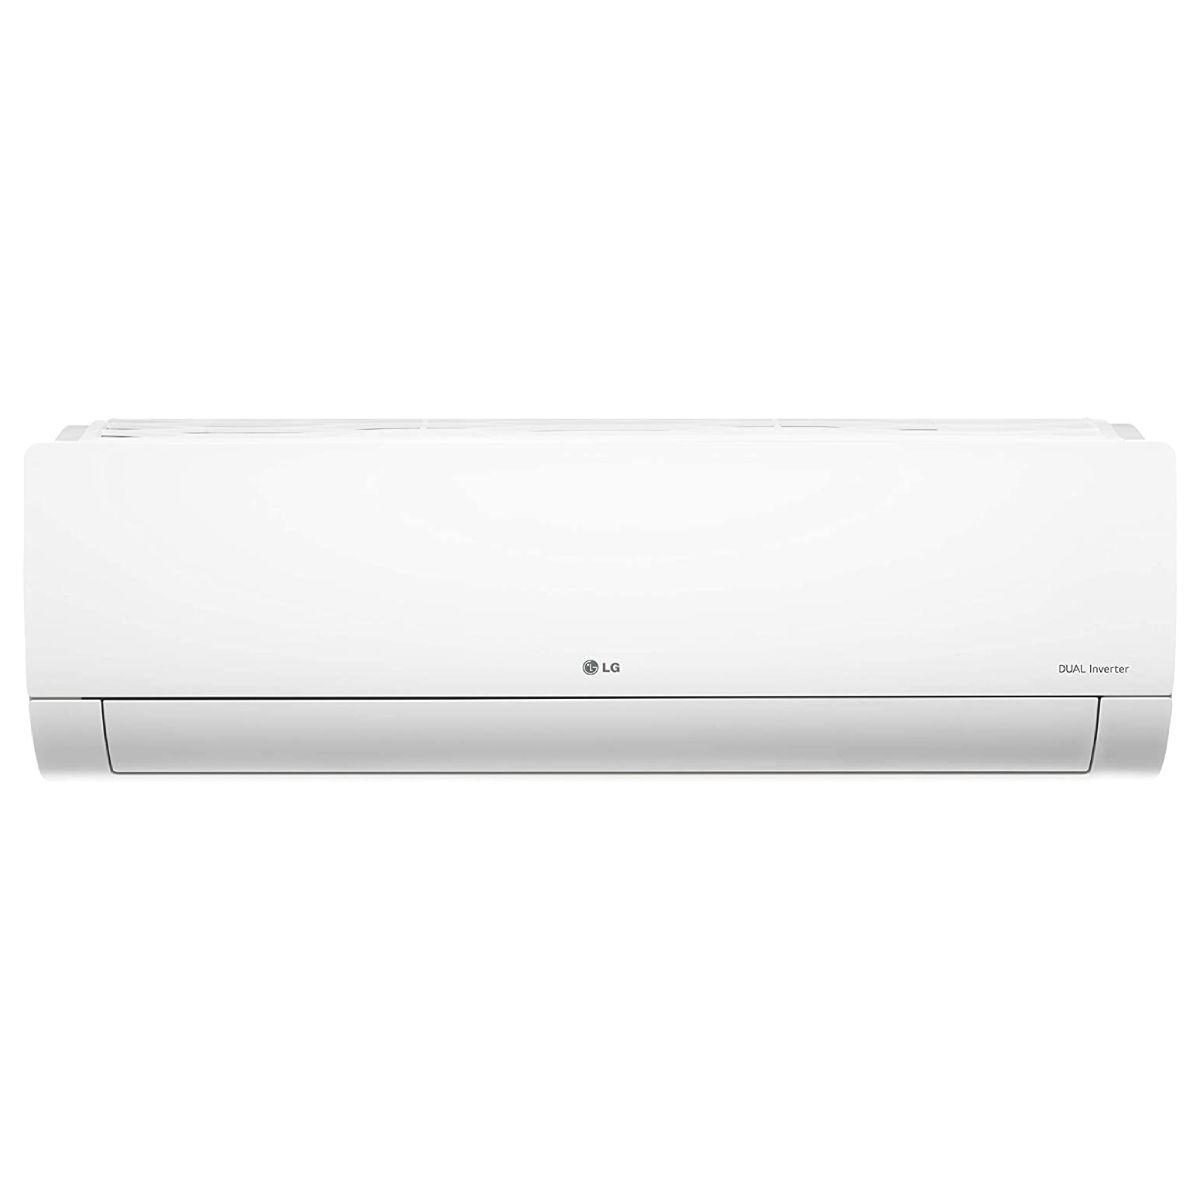 LG 1.5 Ton 4 Star Inverter Split AC (MS-Q18HNYA1)